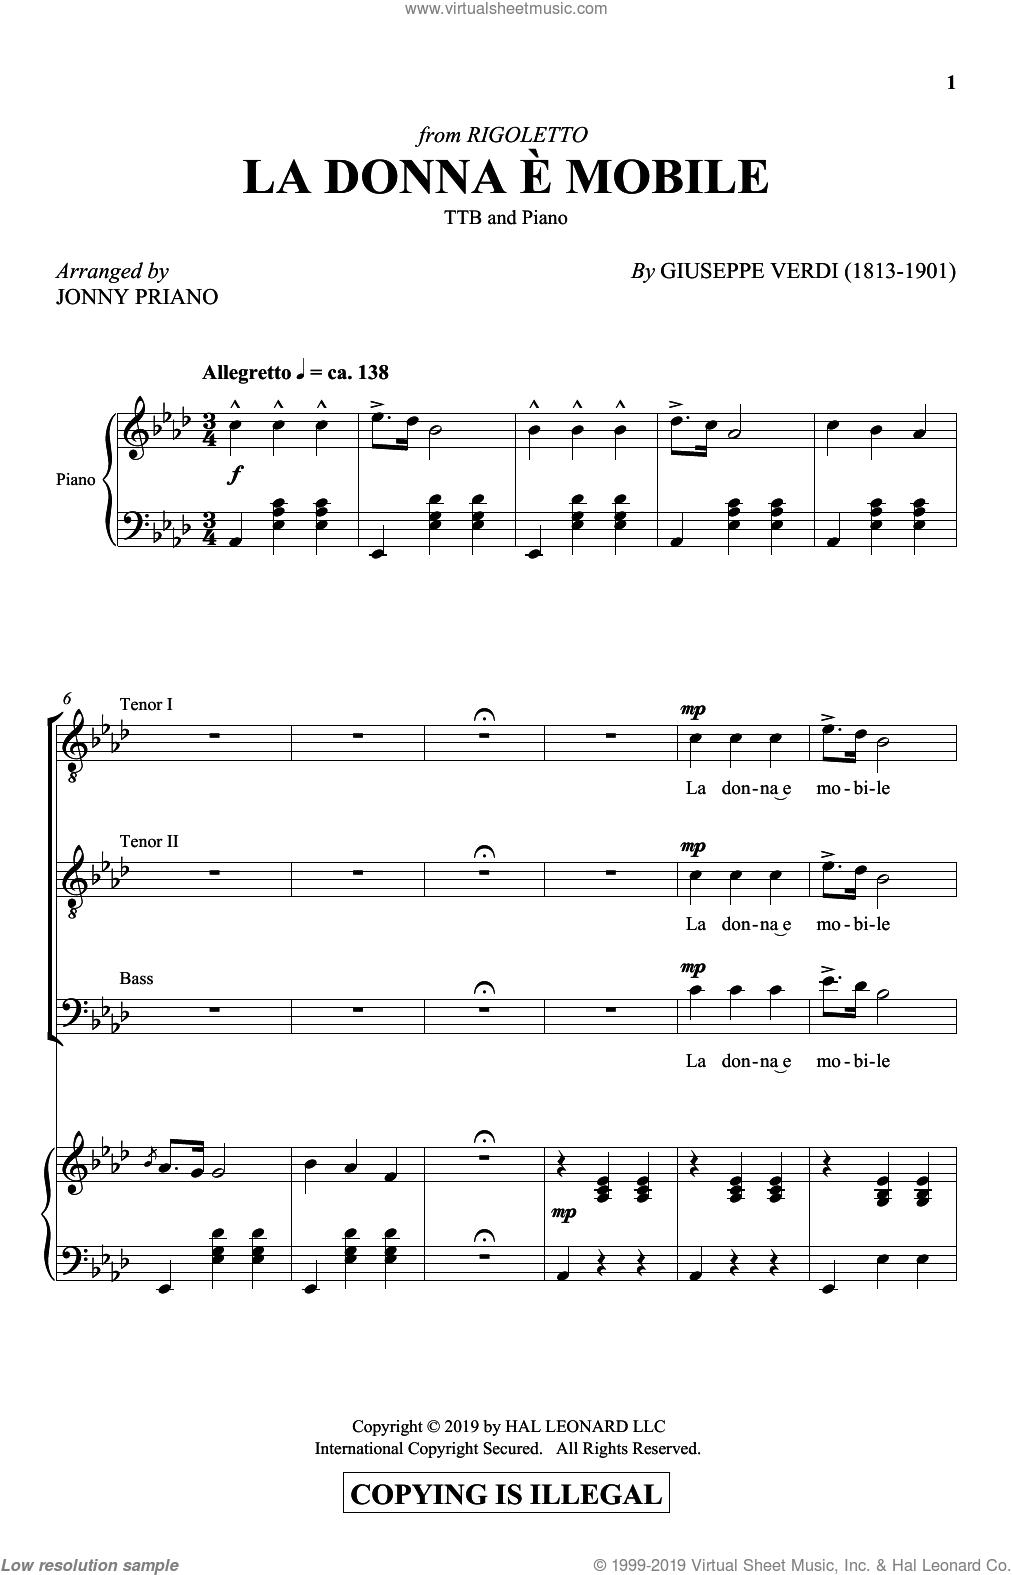 La Donna E Mobile (arr. Jonny Priano) sheet music for choir (TTBB: tenor, bass) by Giuseppe Verdi and Jonny Priano, intermediate skill level